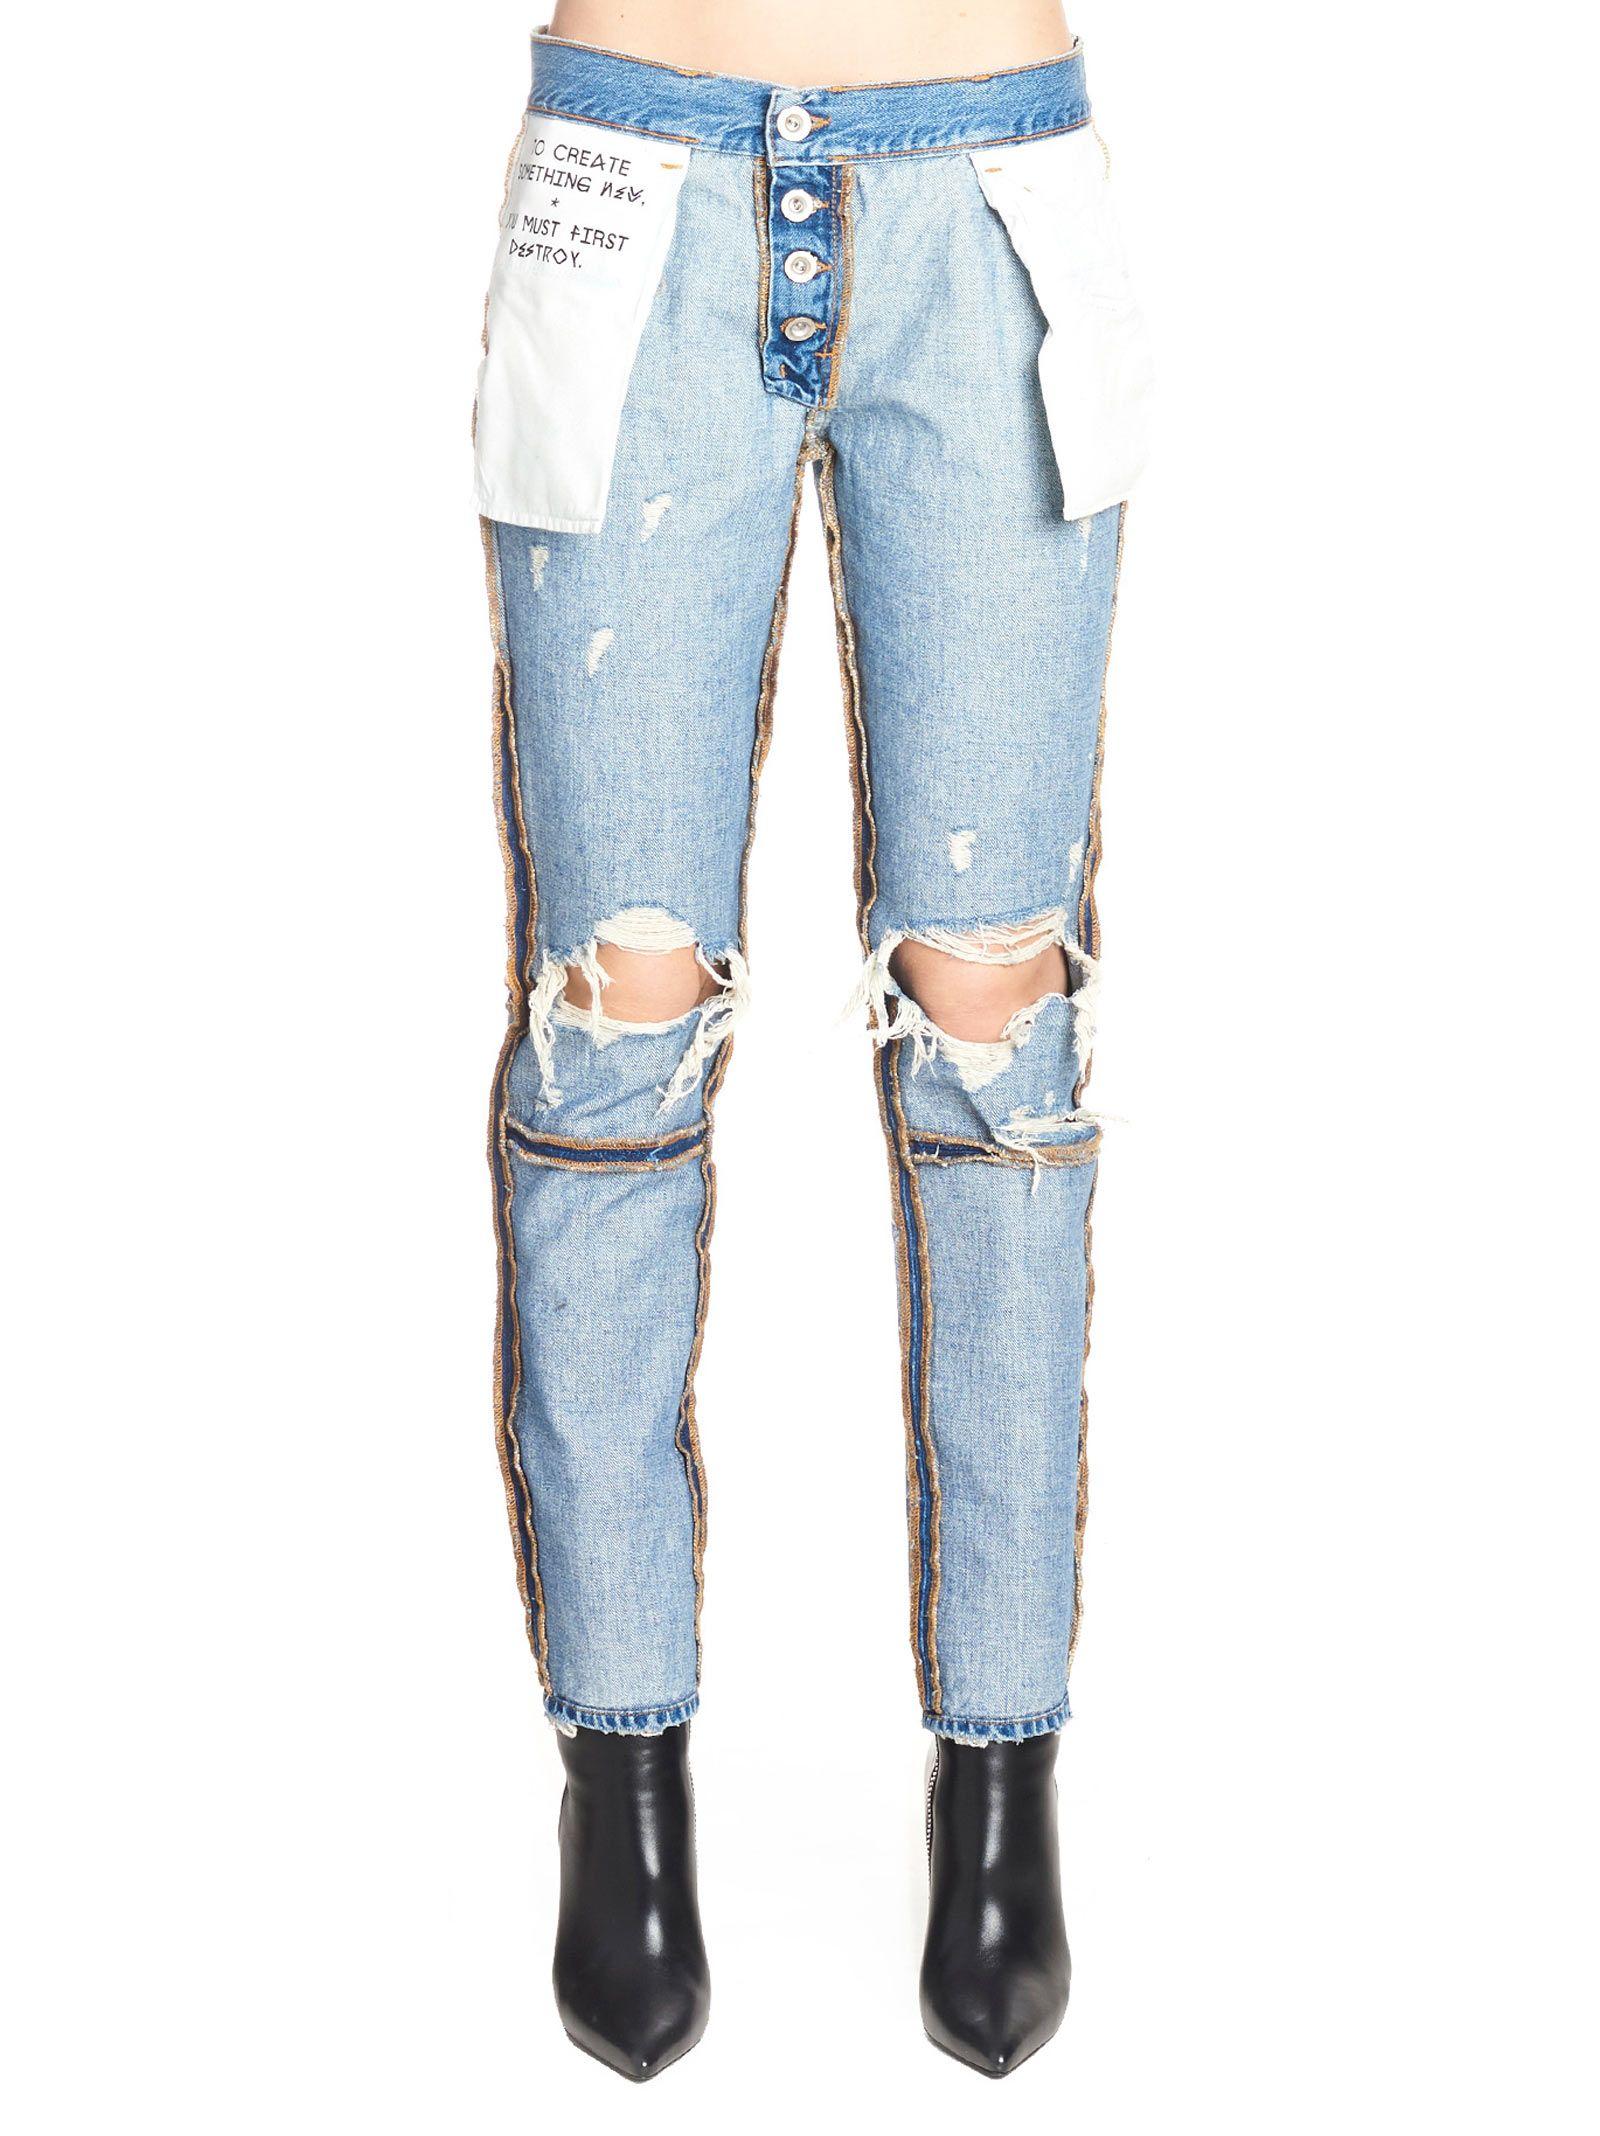 0e9590670d3c Ben Taverniti Unravel Project Ben Taverniti Unravel Project Jeans ...